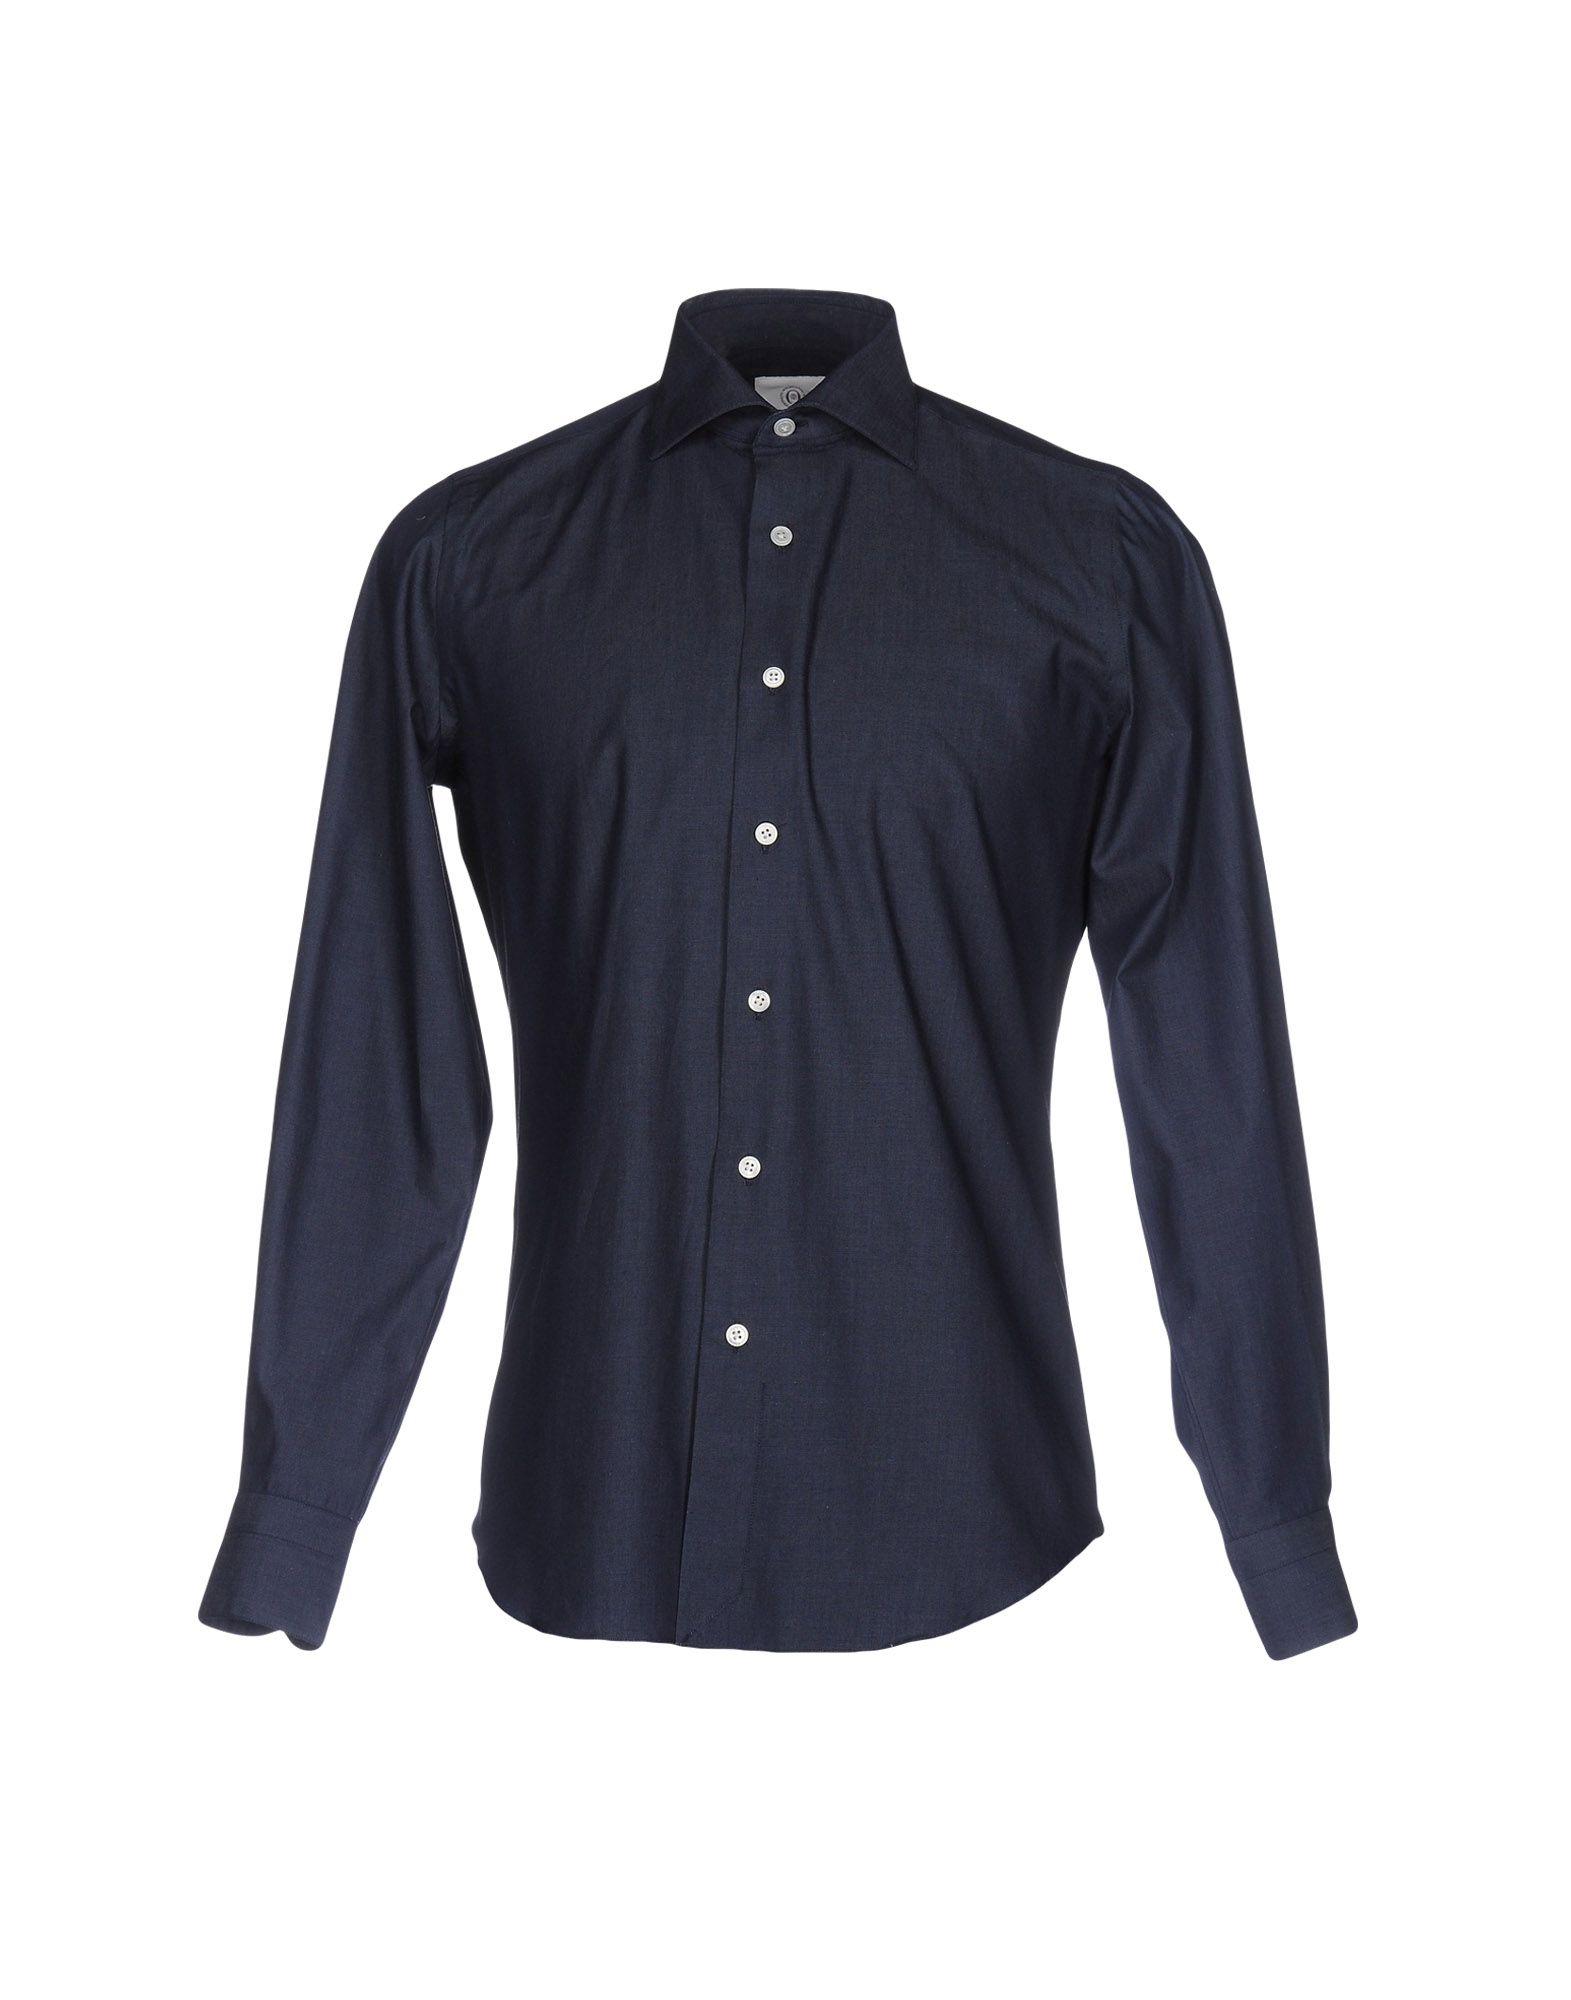 MASSIMO LA PORTA Джинсовая рубашка